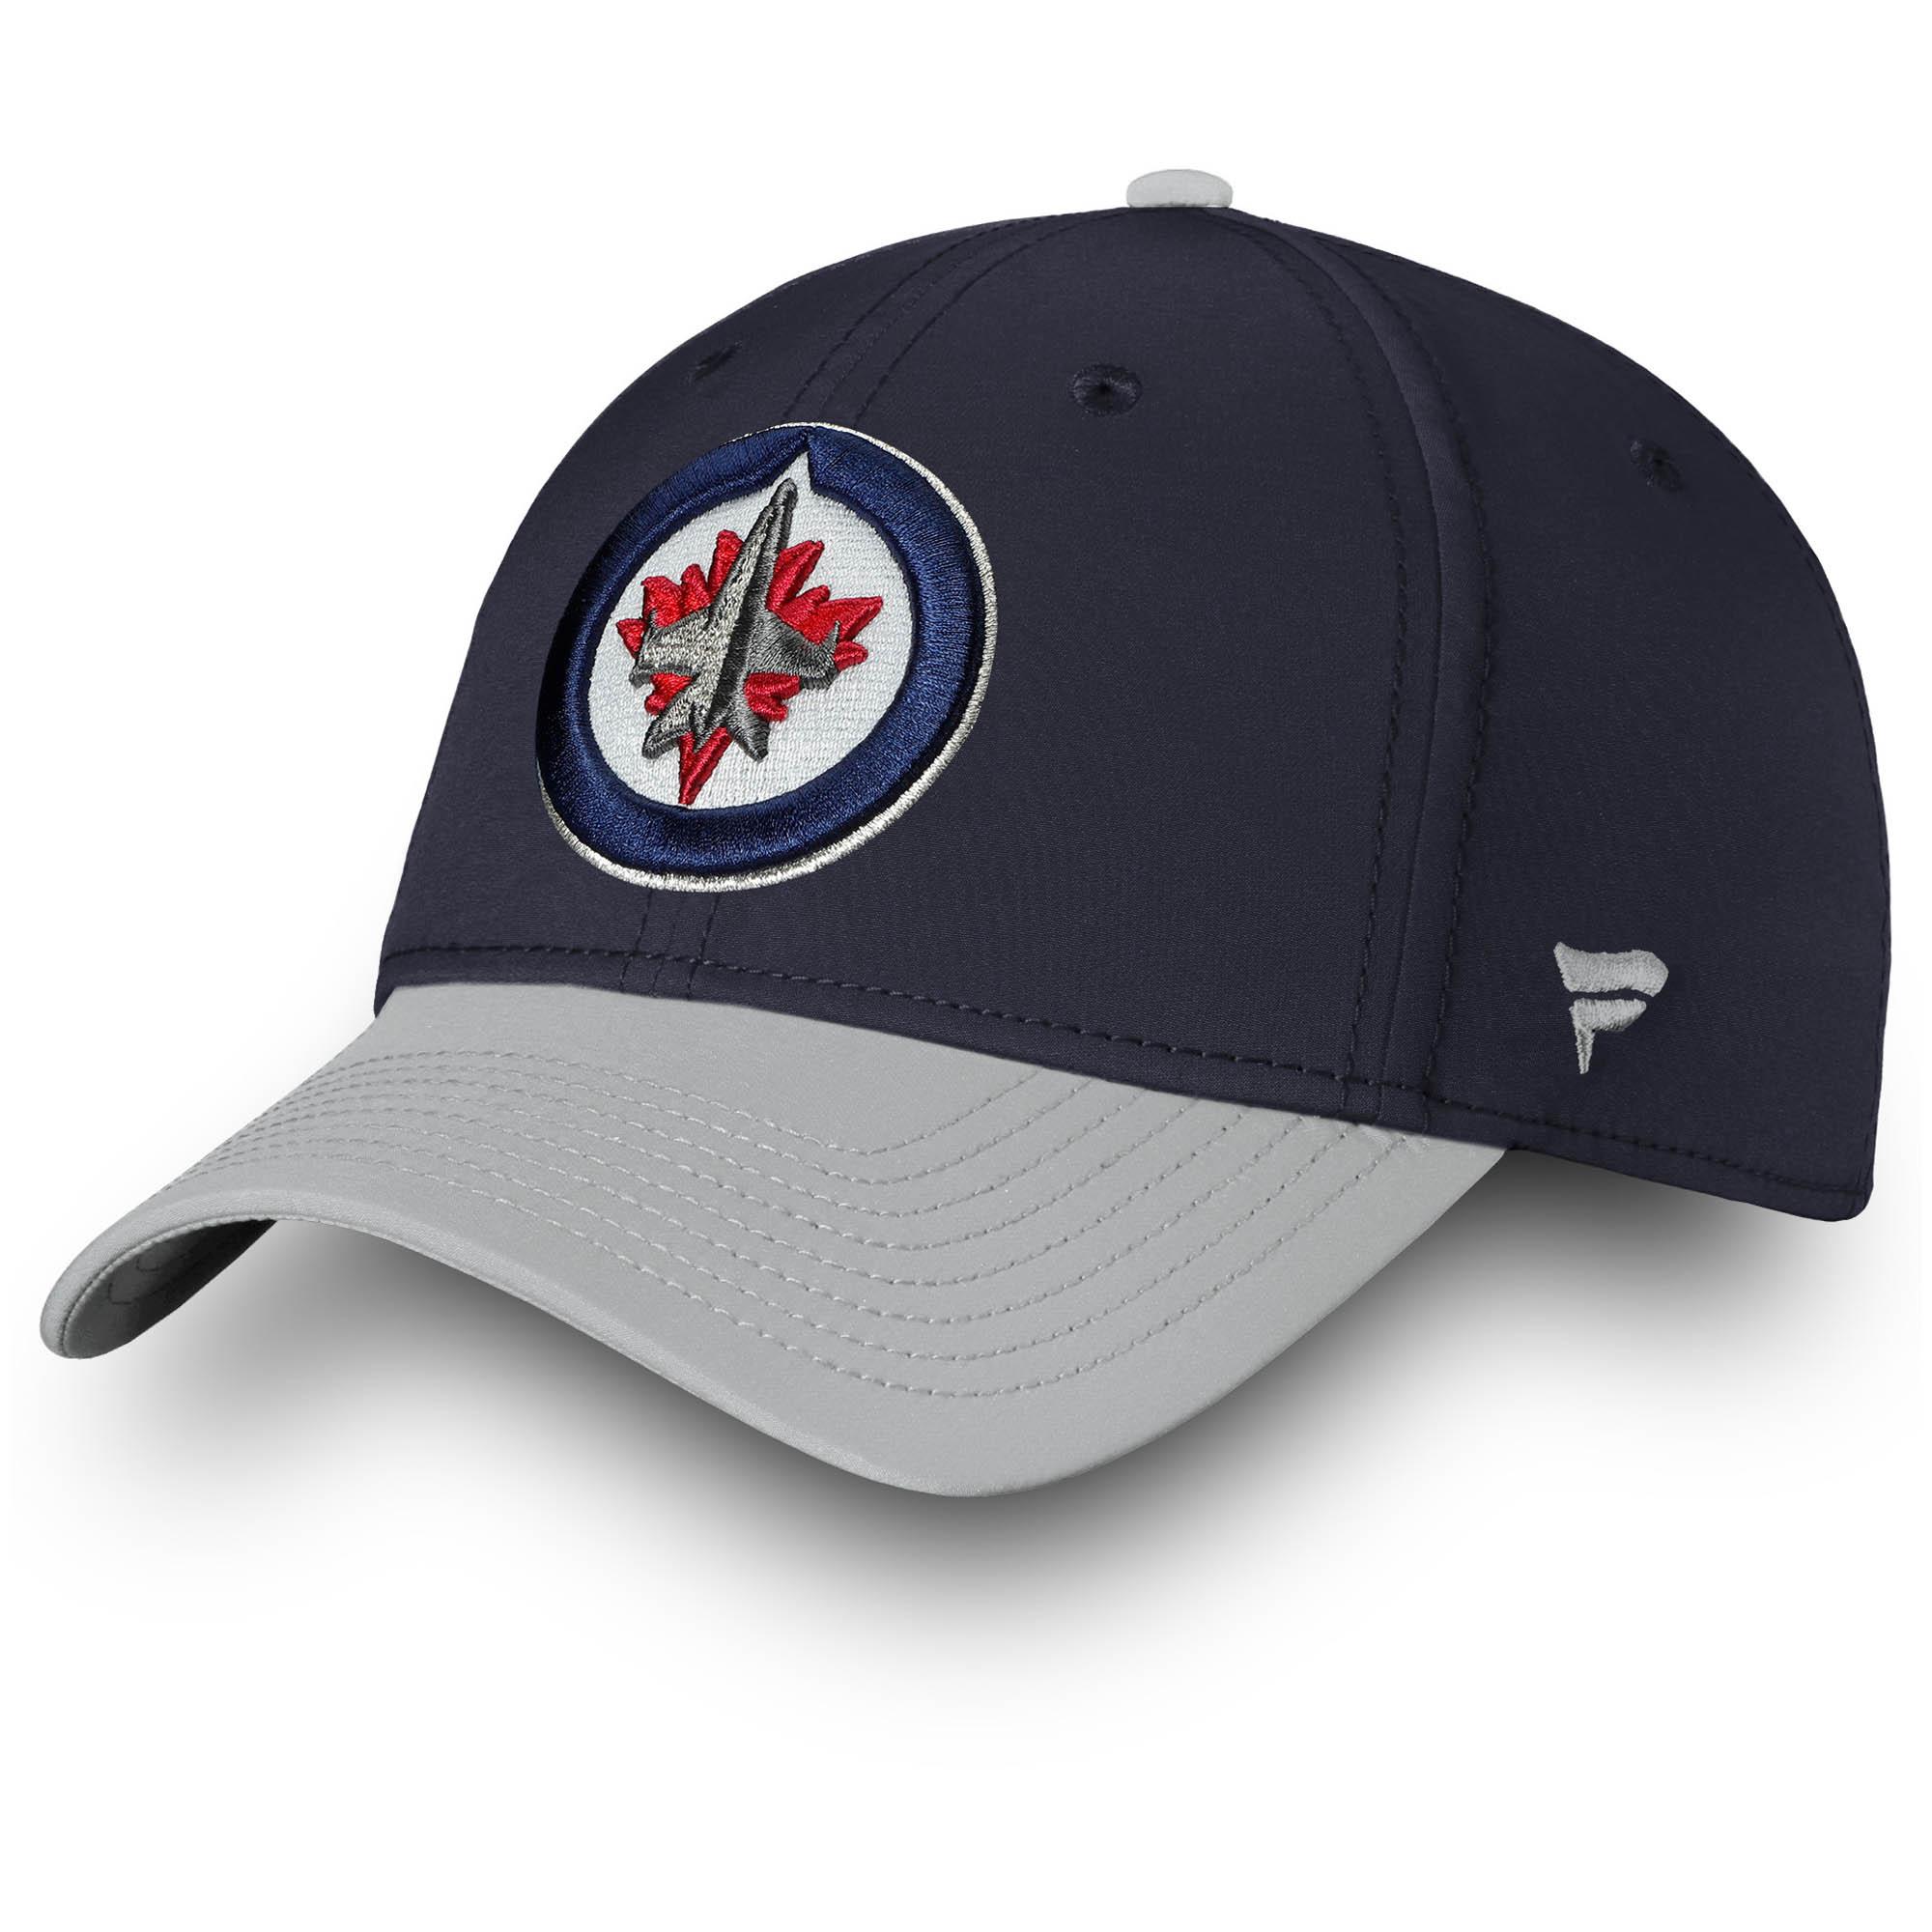 Winnipeg Jets Fanatics Branded Iconic Tech Speed Flex Hat - Navy/Gray